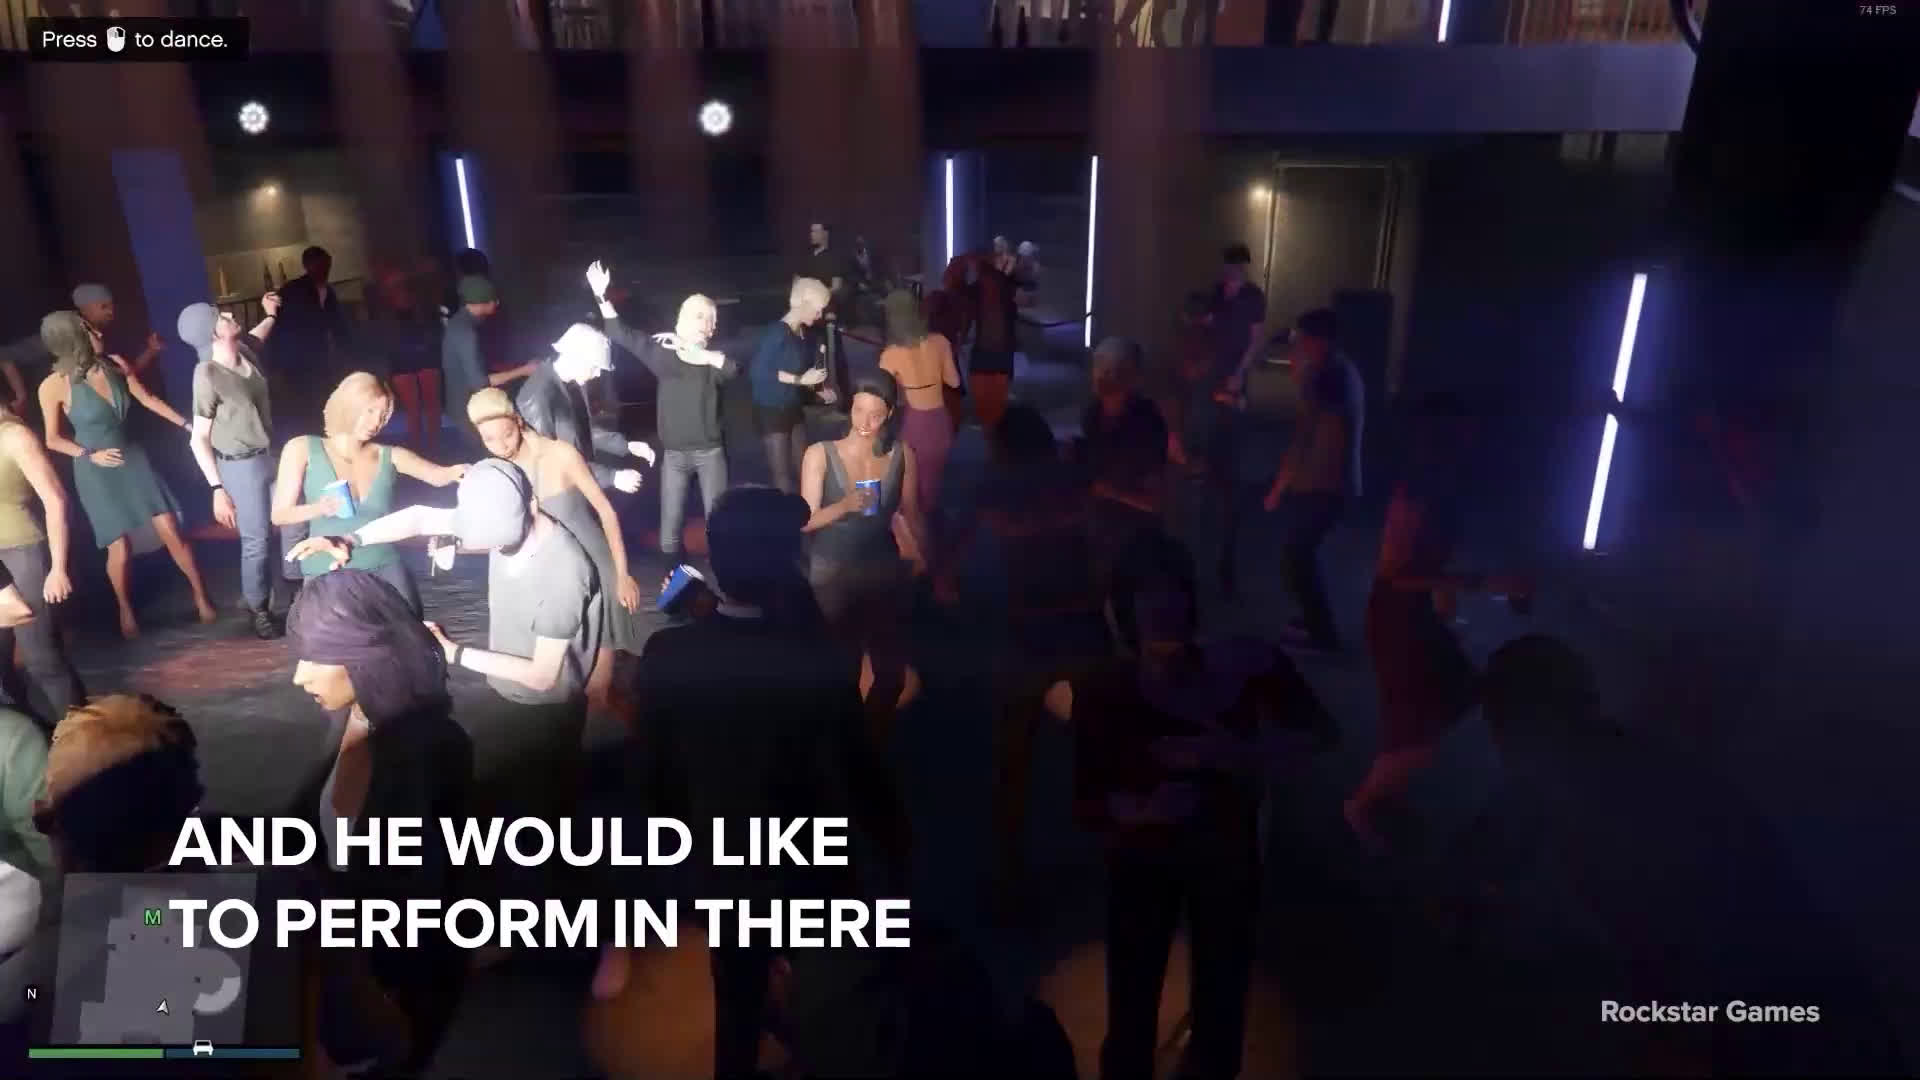 Is GTA Online the next platform to host live concerts?